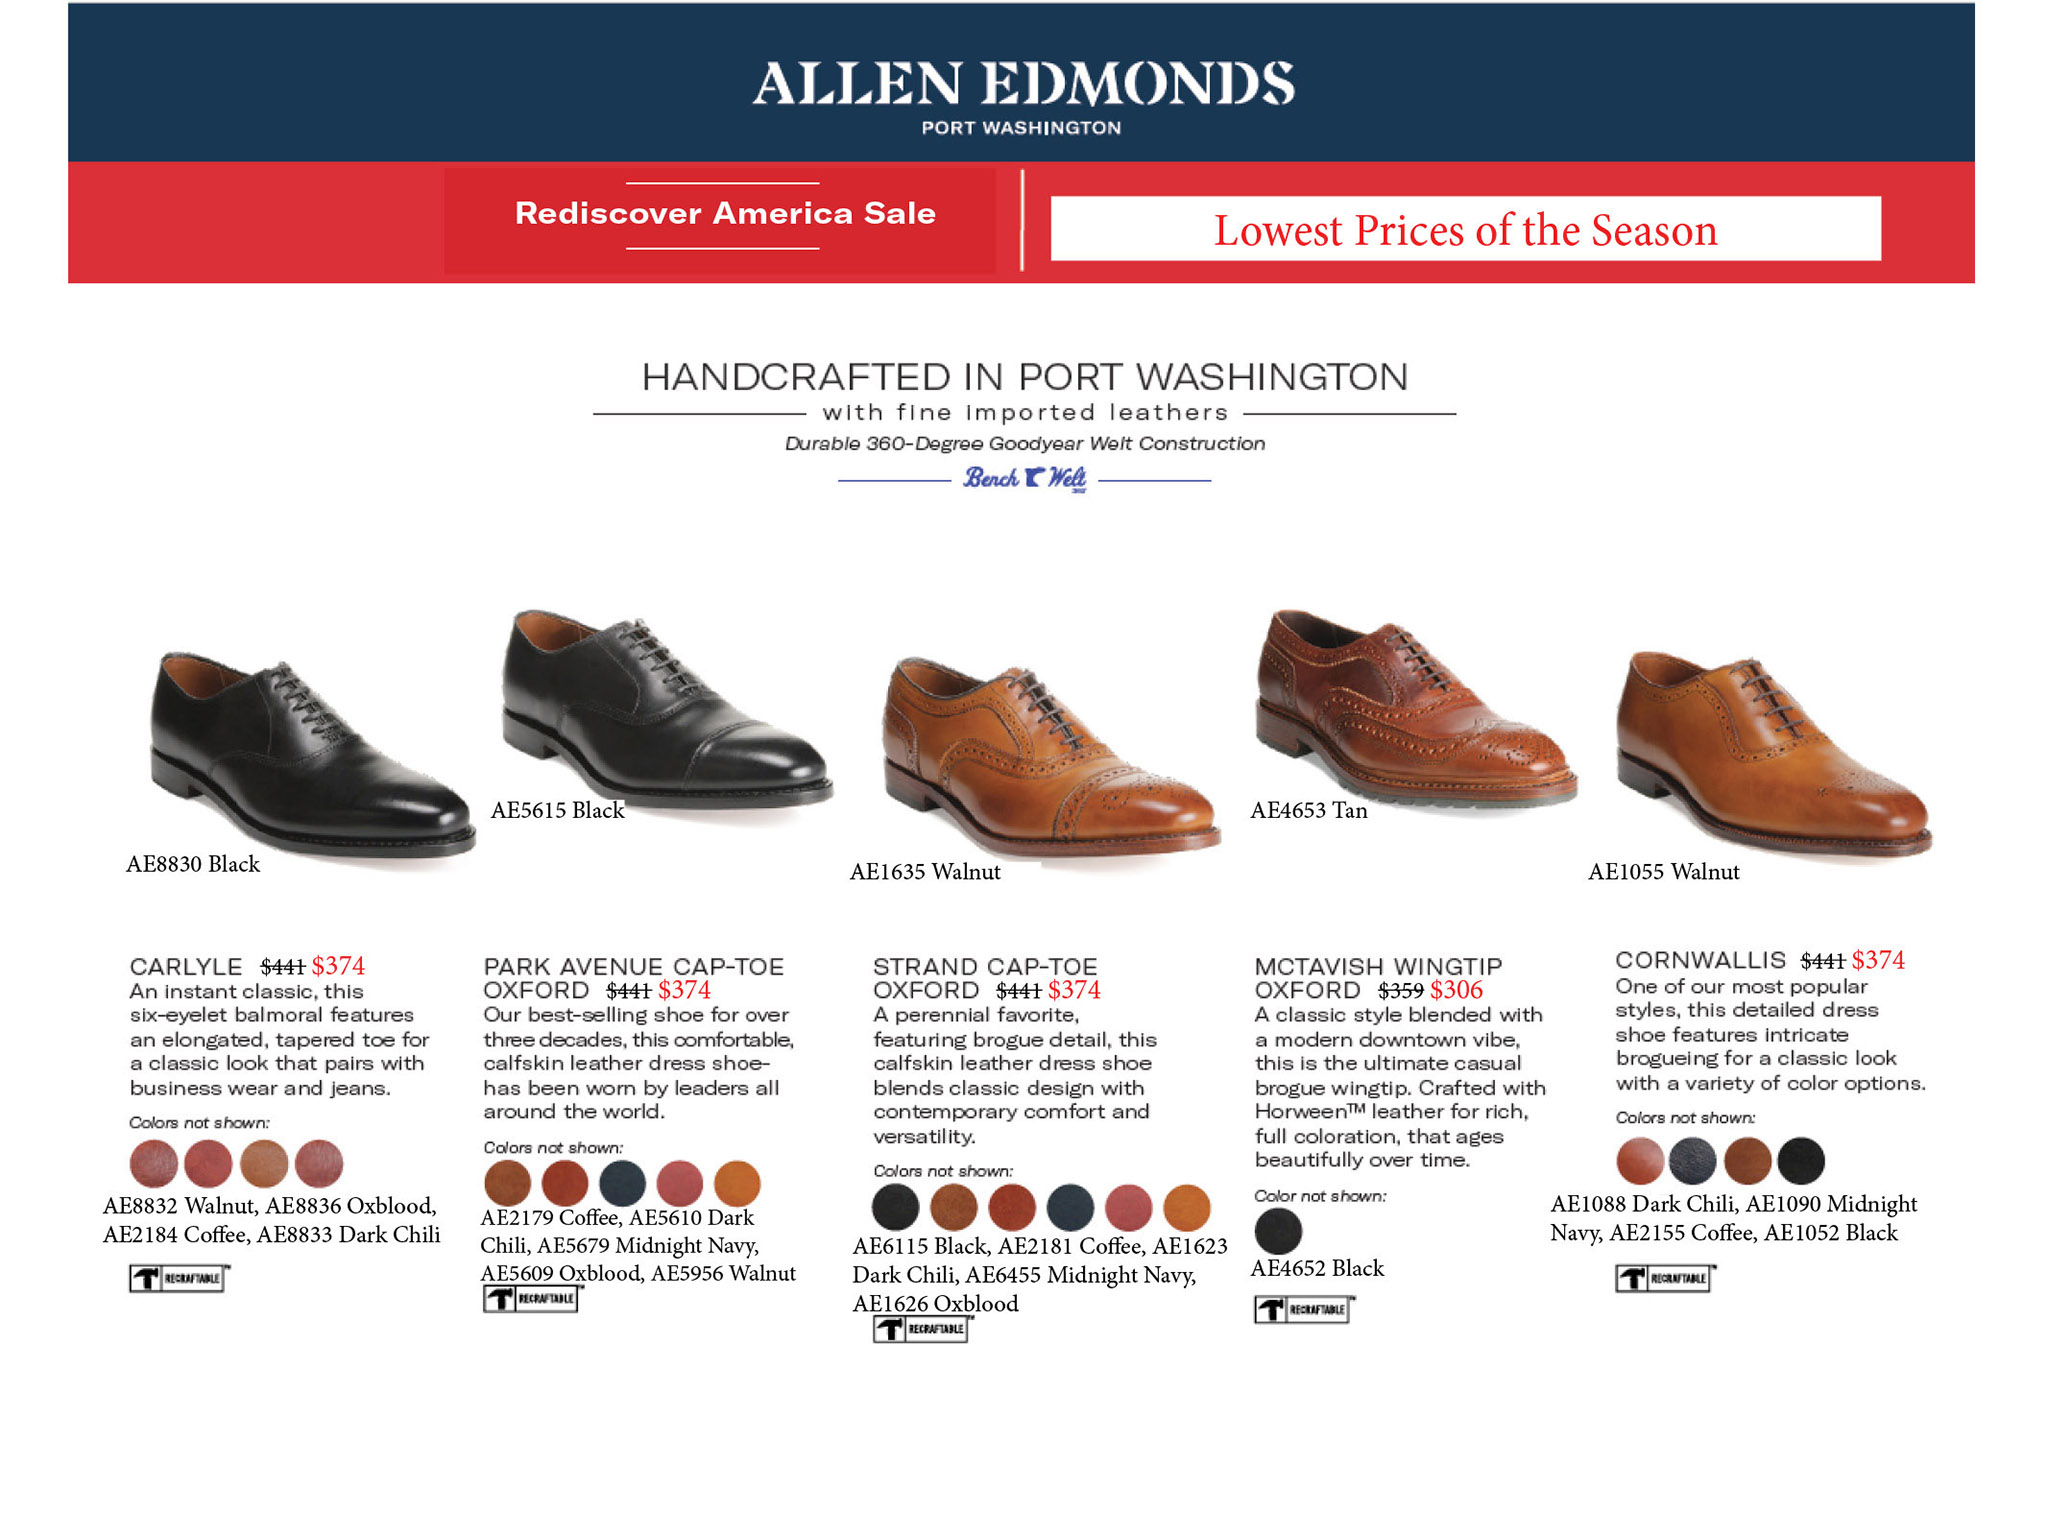 allen edmonds sale shoe made in america lace up slip on black brown